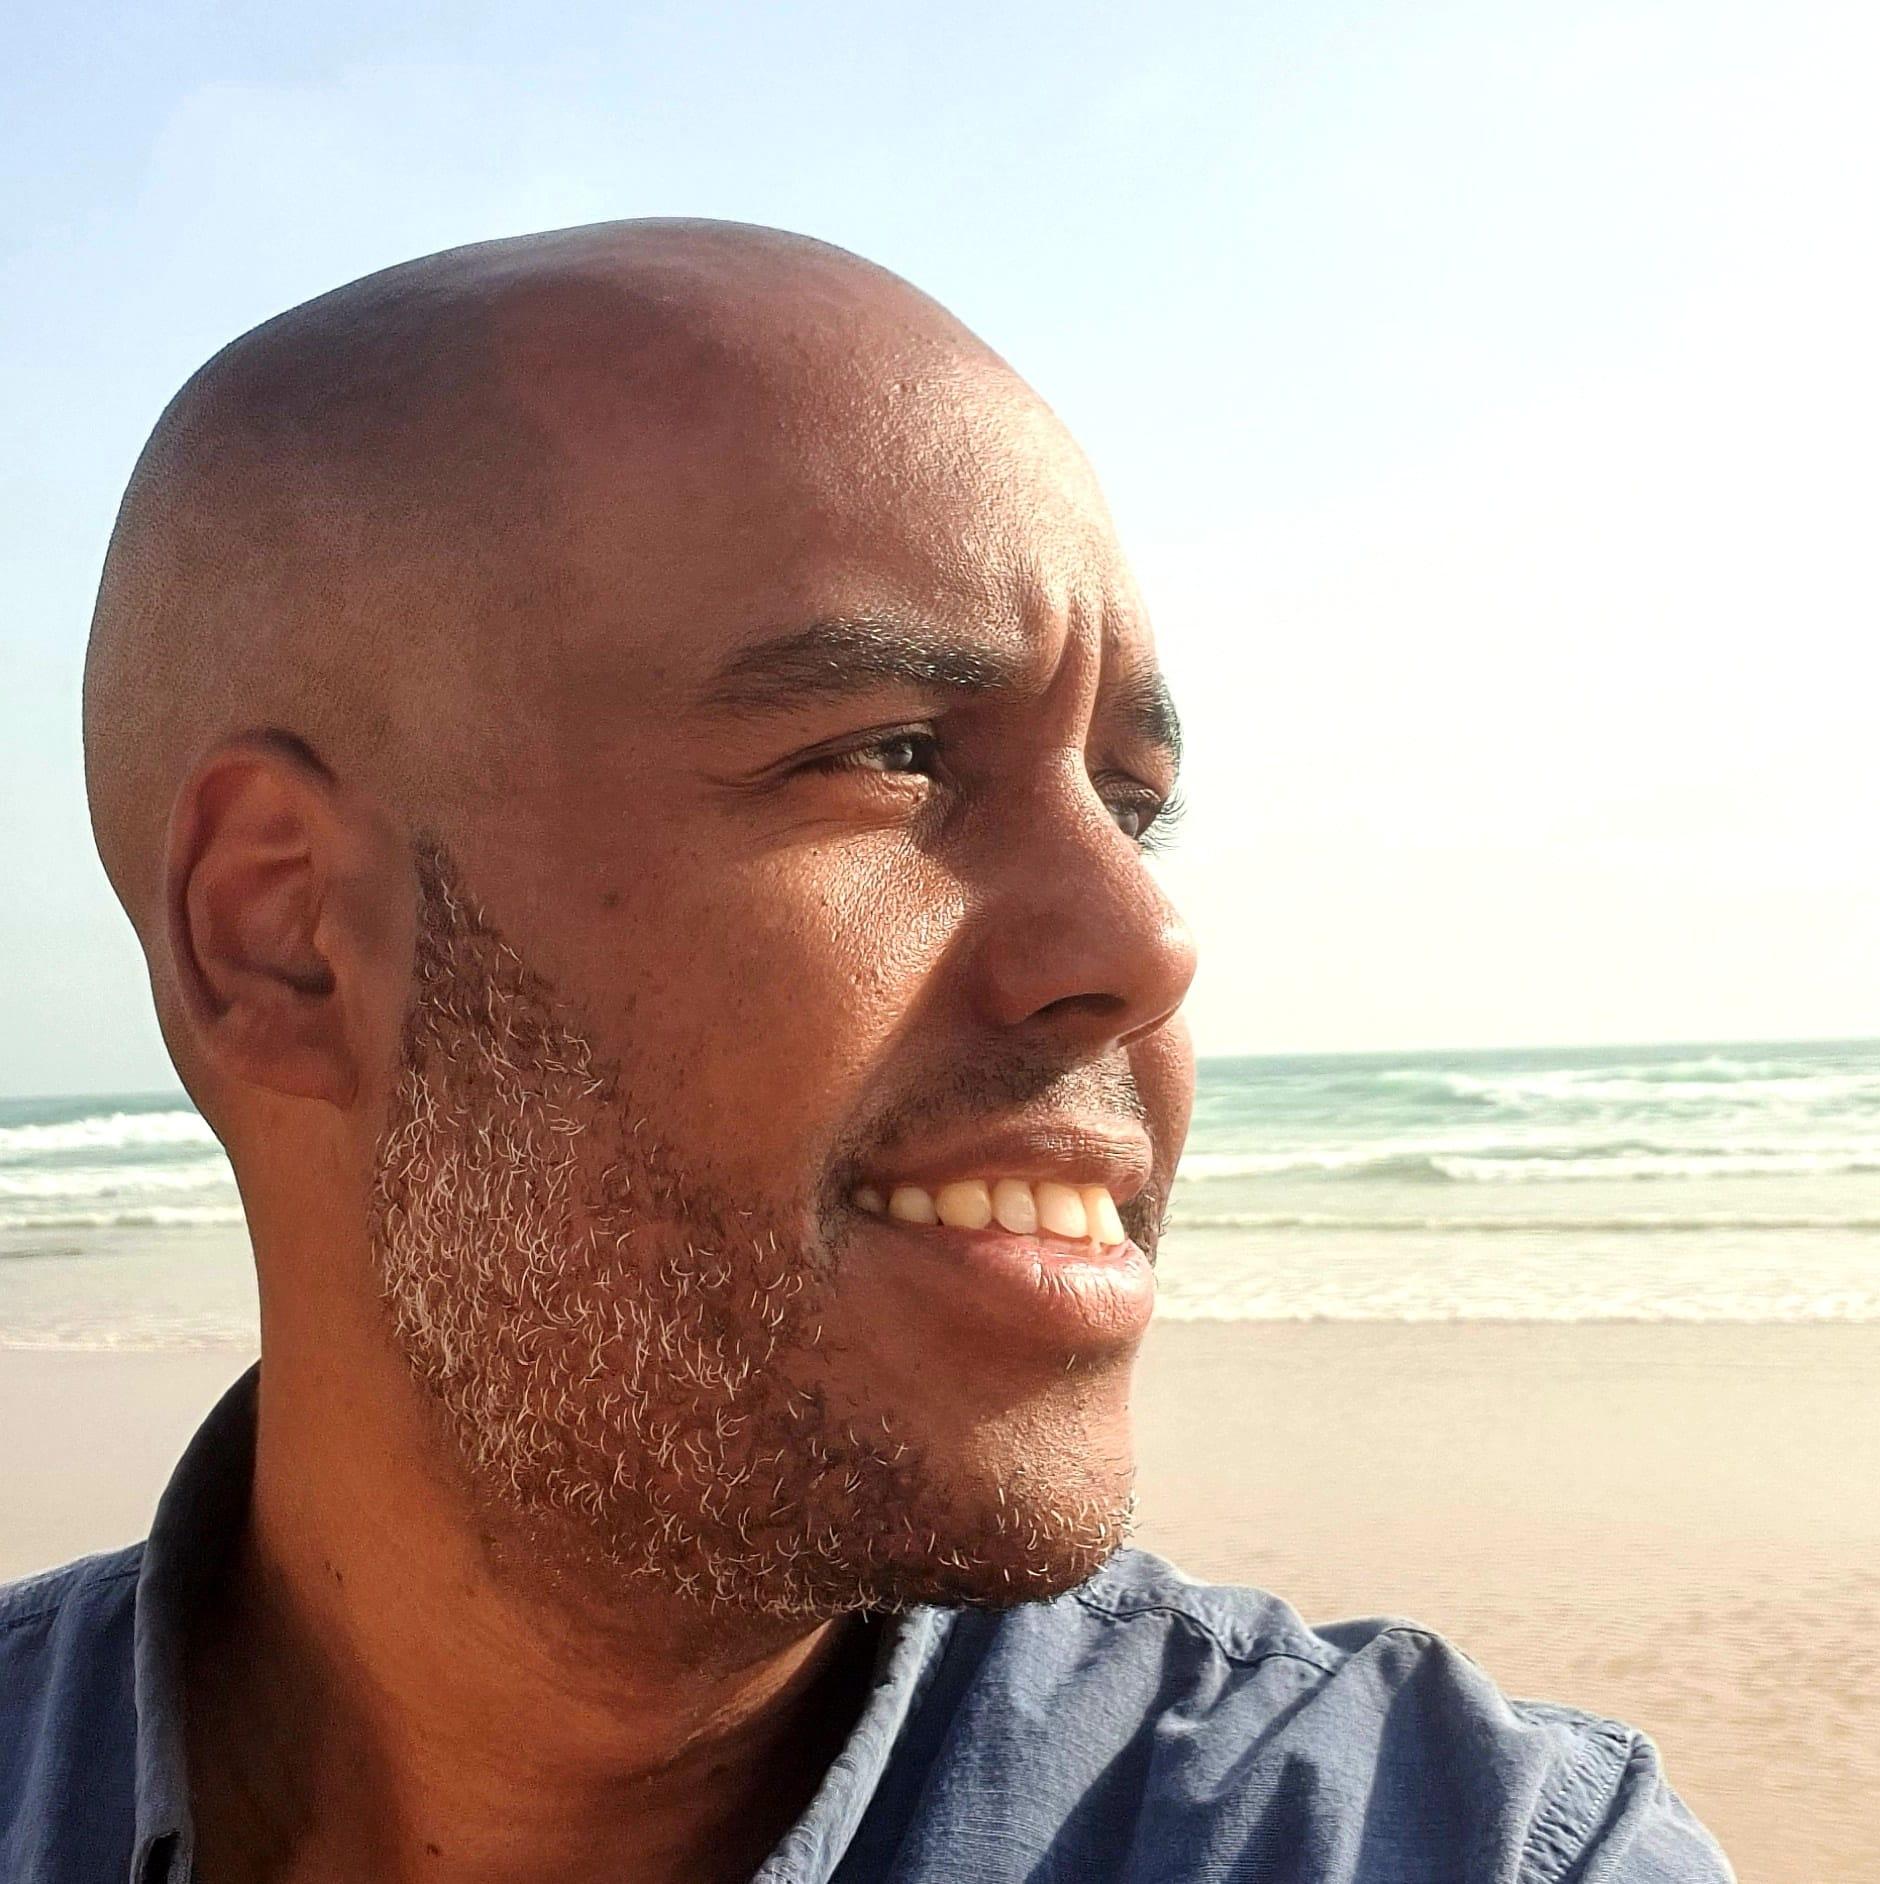 Bilal Machraa